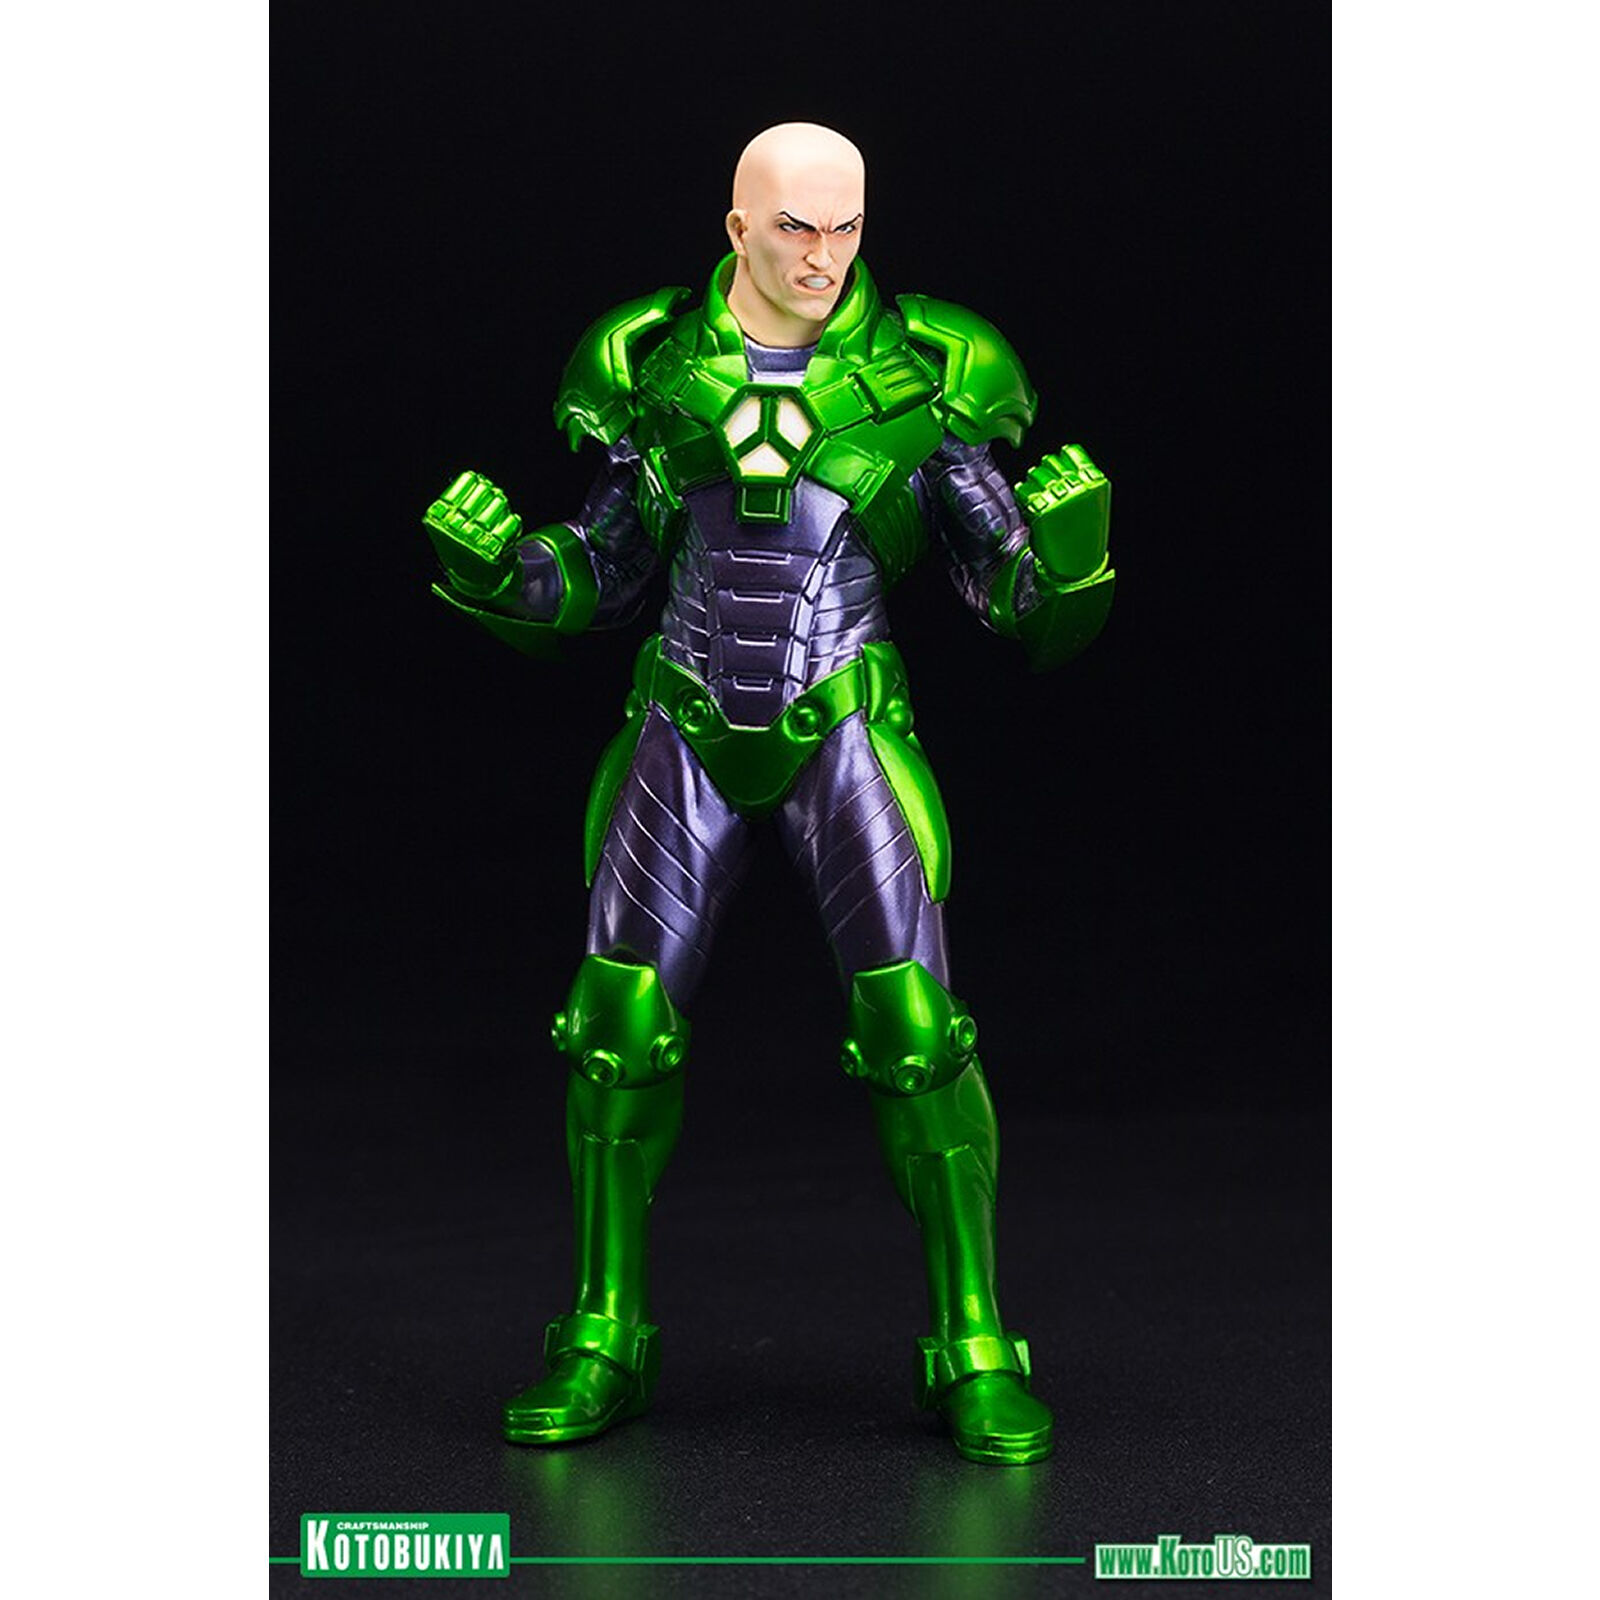 Kotobukiya - DC COMICS Lex Luthor  nuovo 52   Artfx+ Statue - BNIB   migliore marca